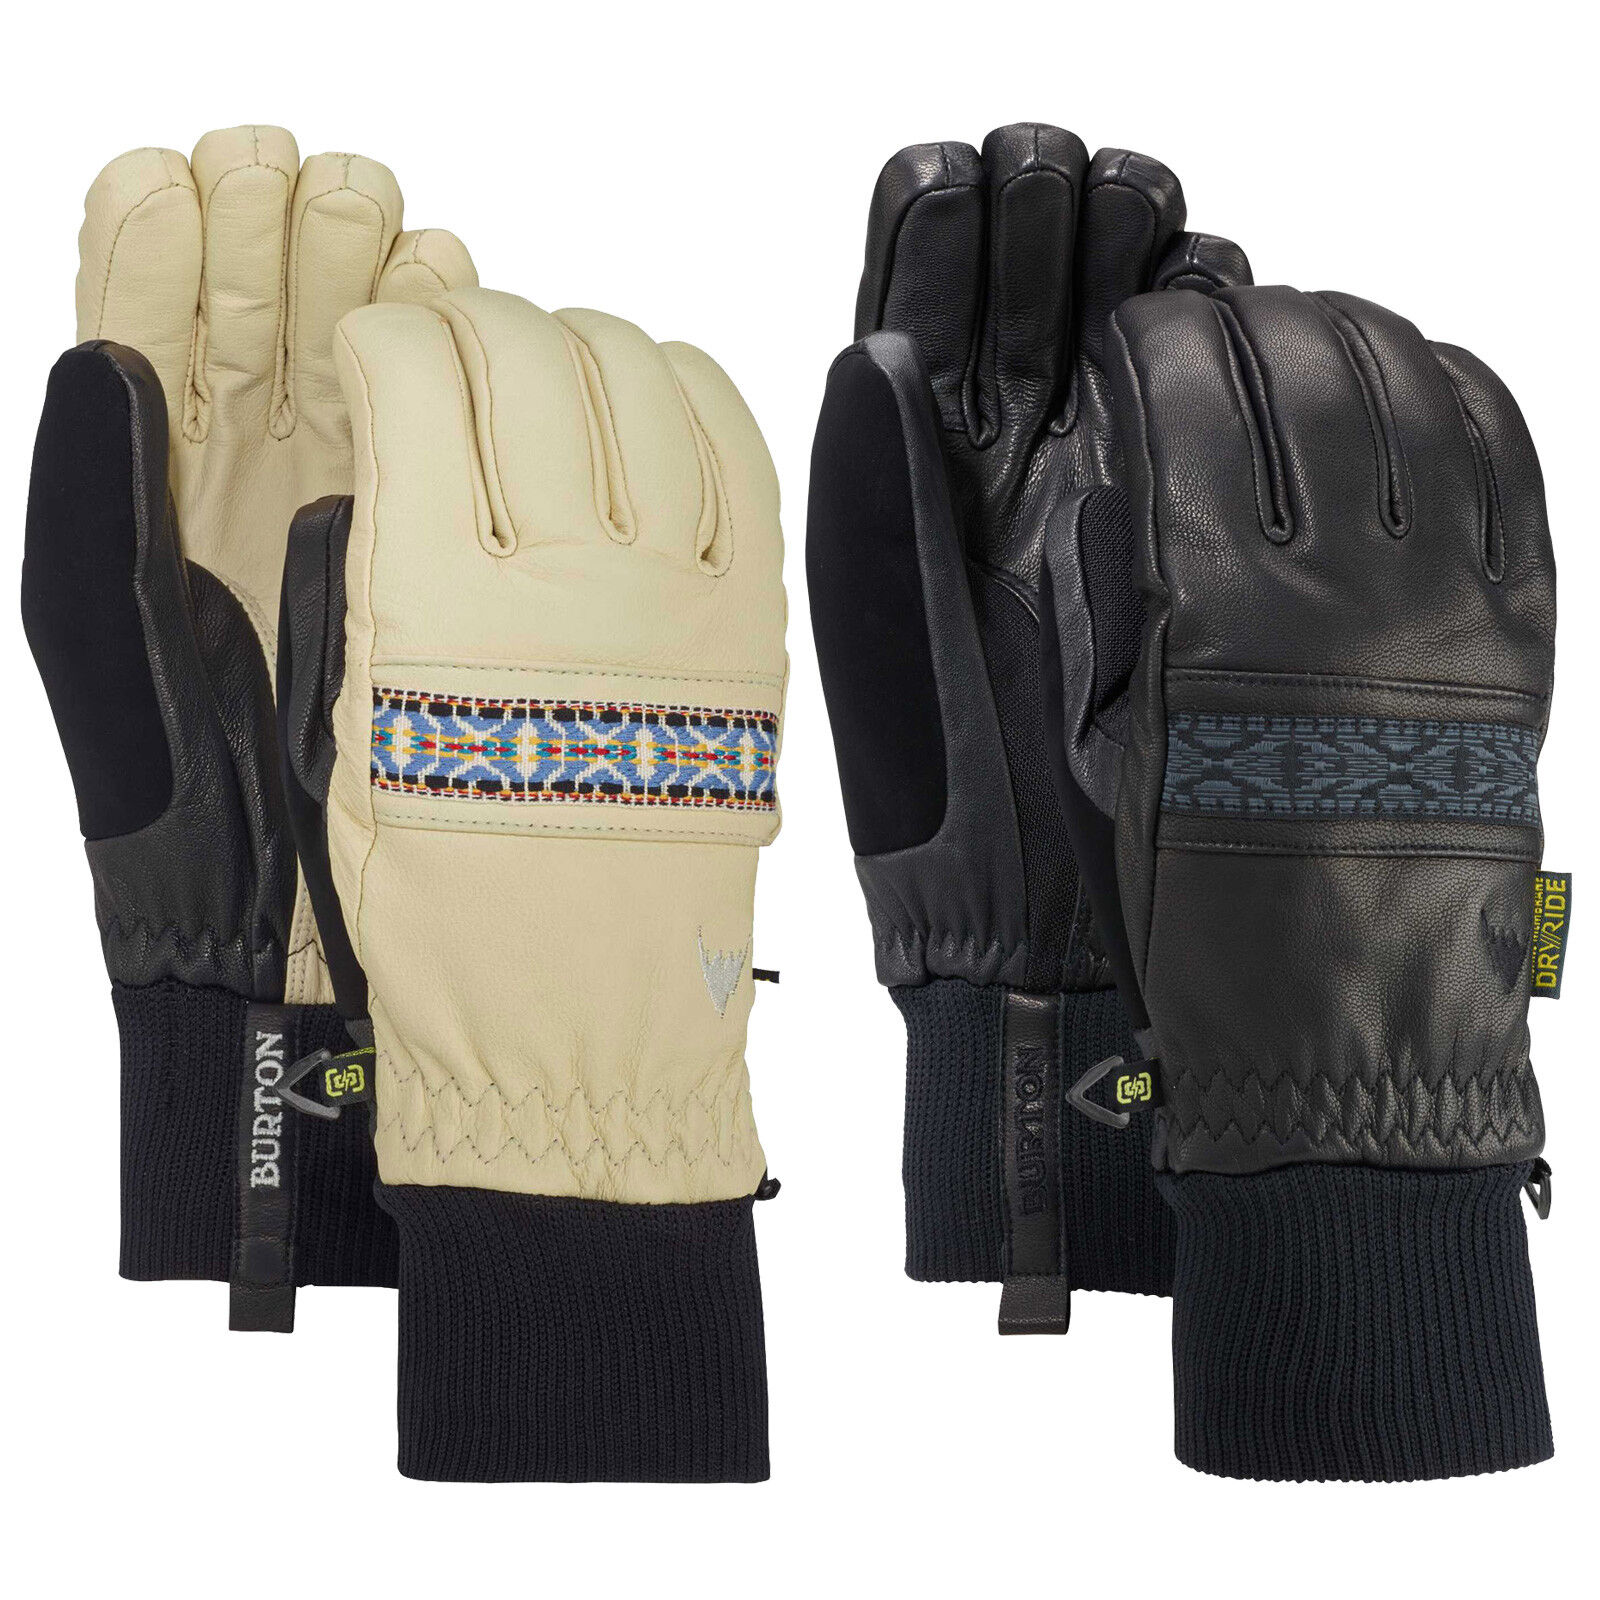 Burton Free Range Glove Lederhandschuhe Damen-Handschuhe Skihandschuhe Snowboard